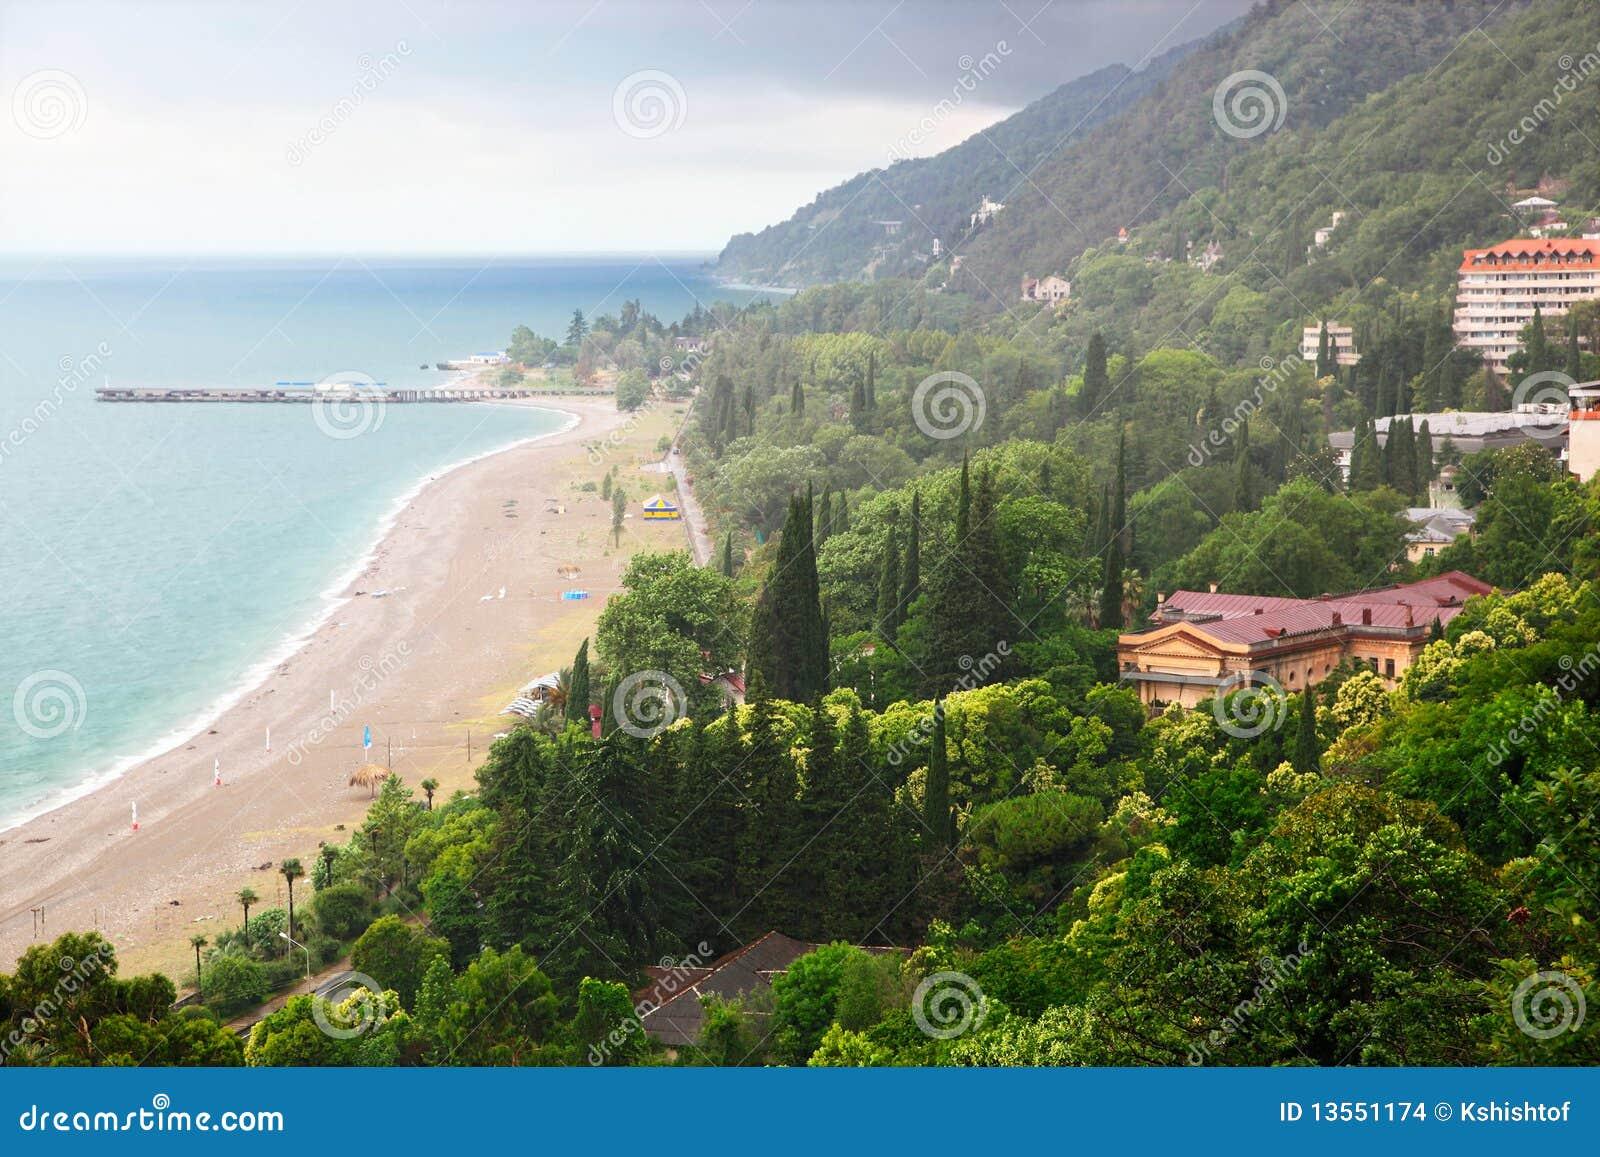 Gagra resort: beaches of new and old Gagra